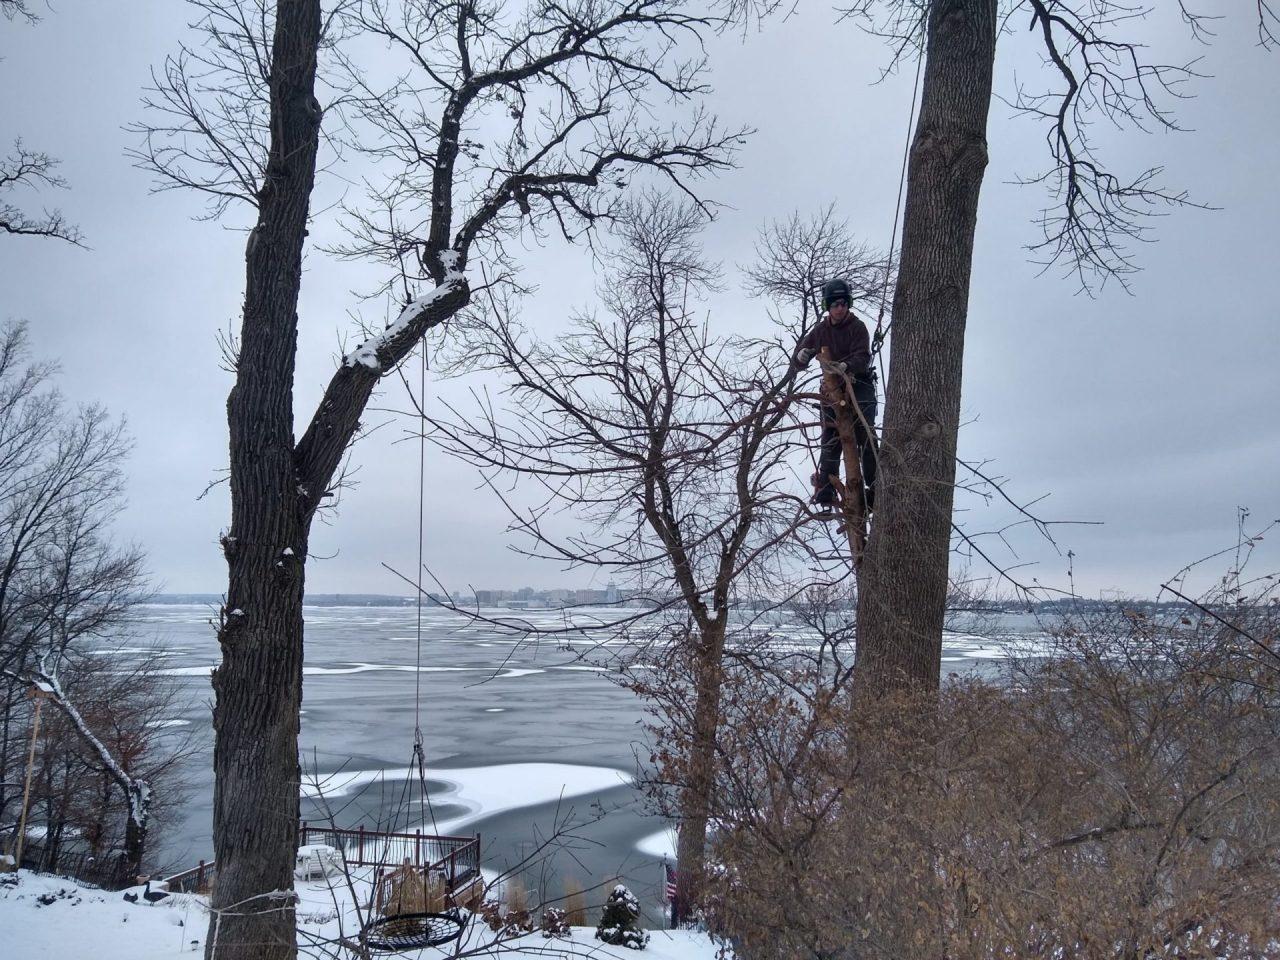 Tree pruning in winter